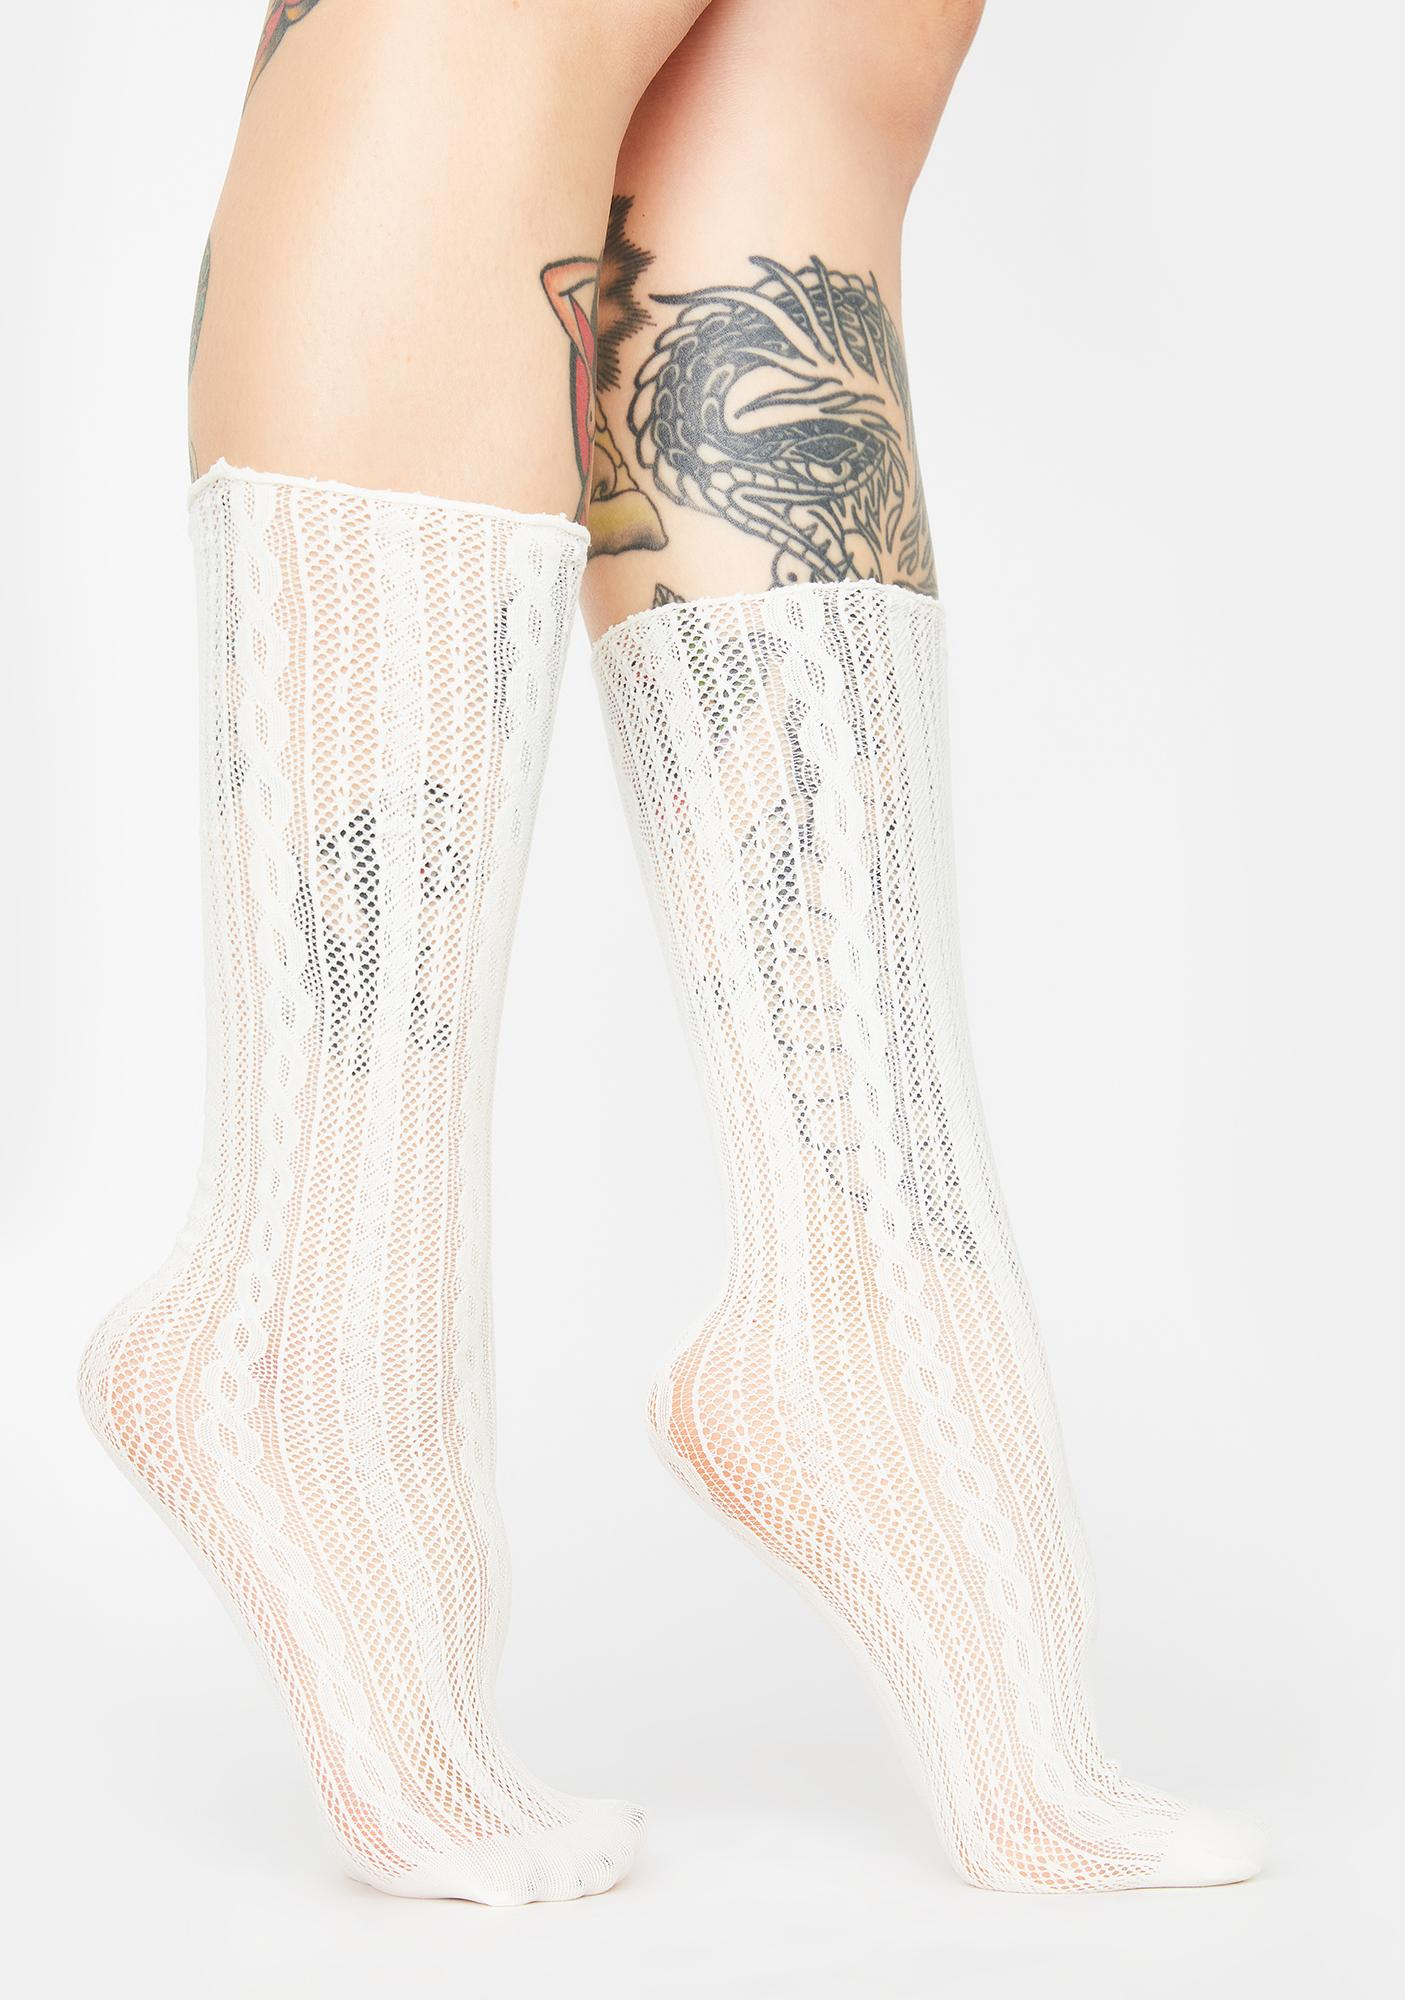 Bliss On My Mind Knit Socks